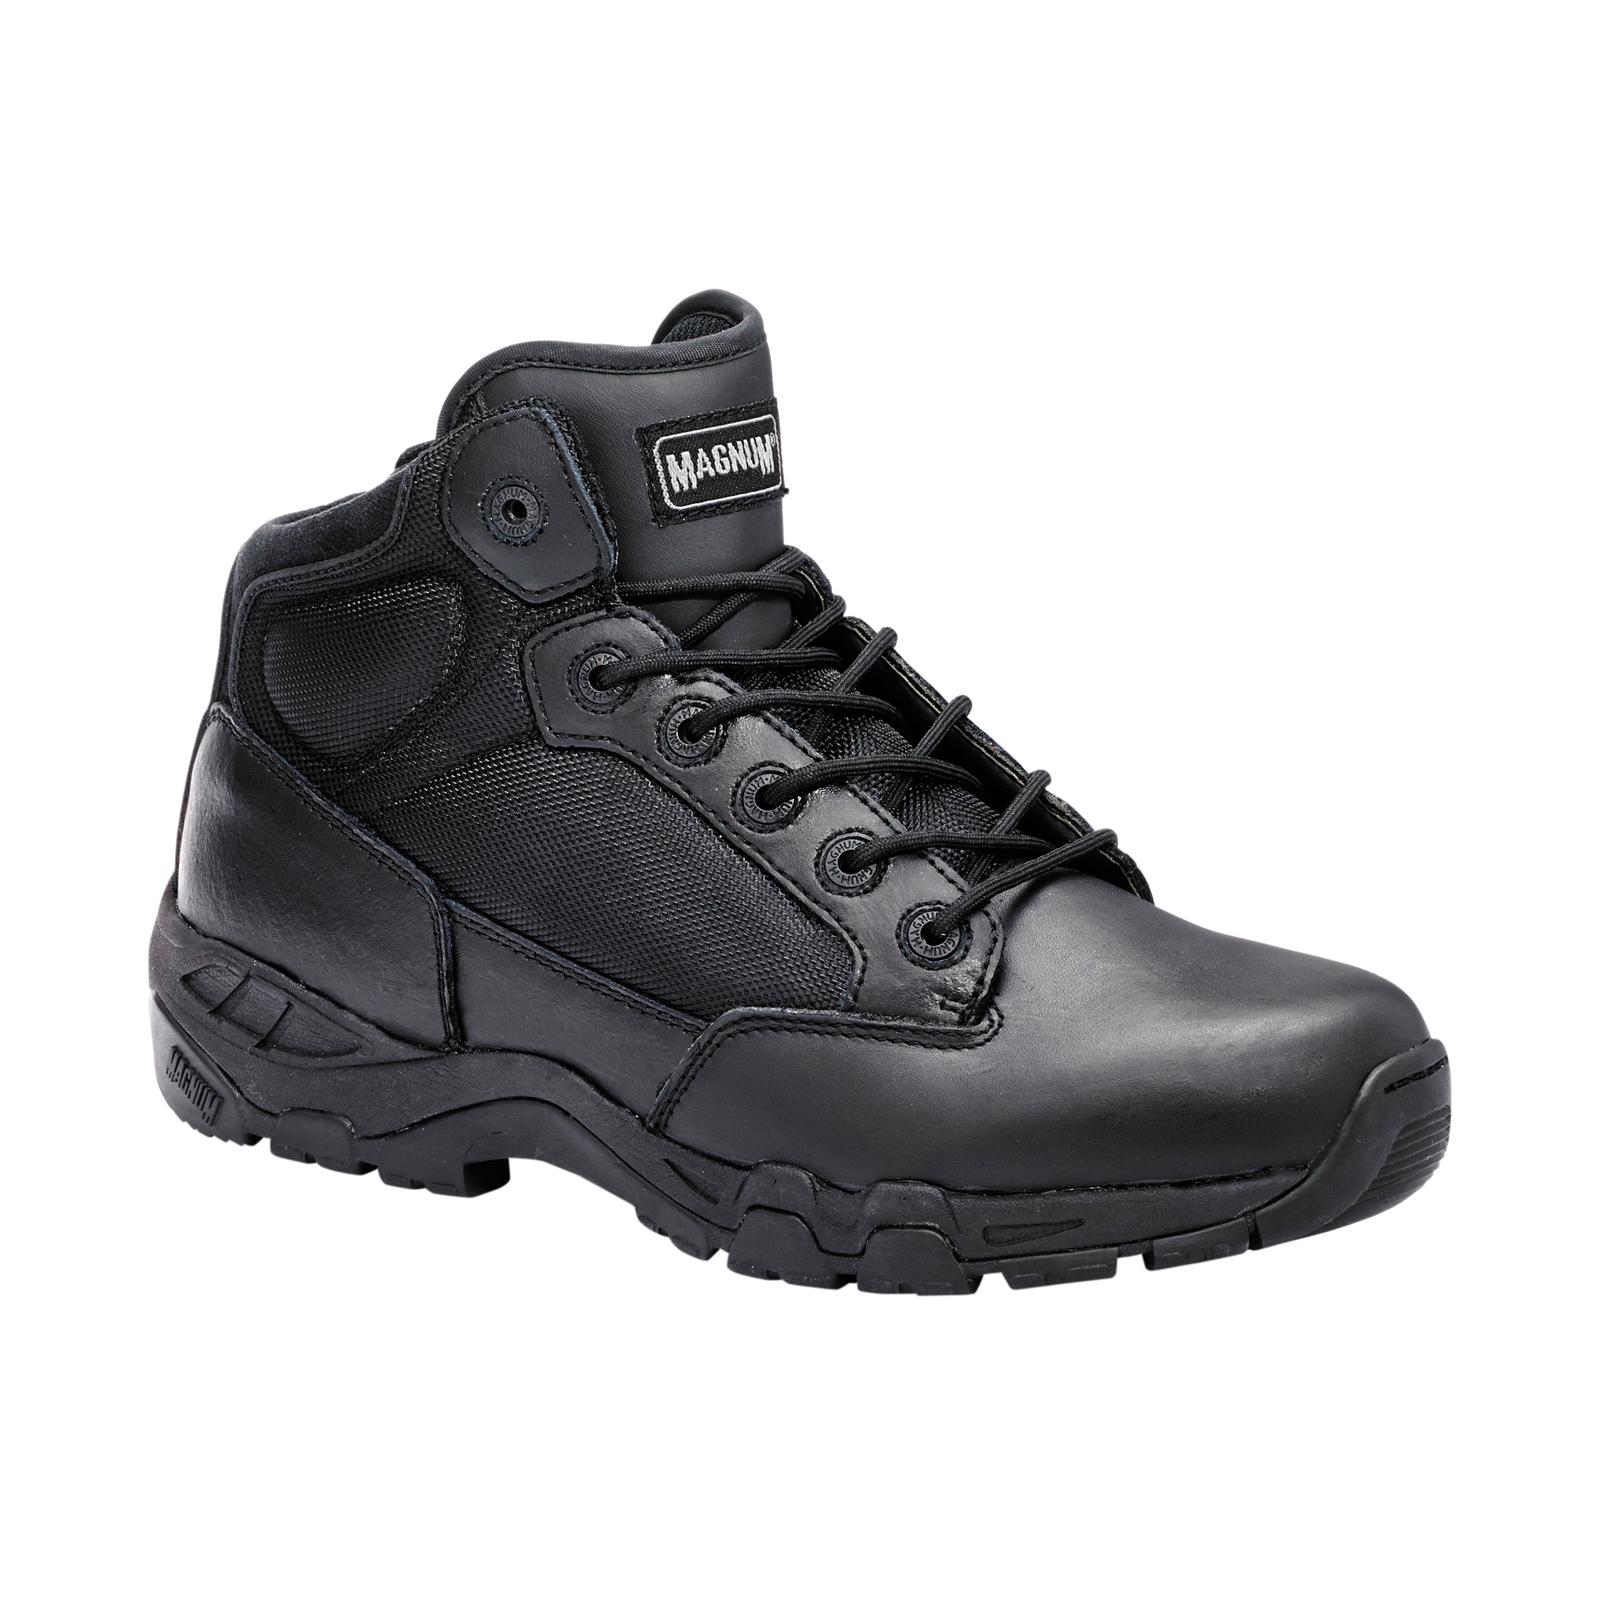 "Magnum Essential Equipment Men's 5"" Black Viper Pro Soft Toe Zipper Water Proof Boot PartNumber: 3ZZVA66706112P MfgPartNumber: 5479"